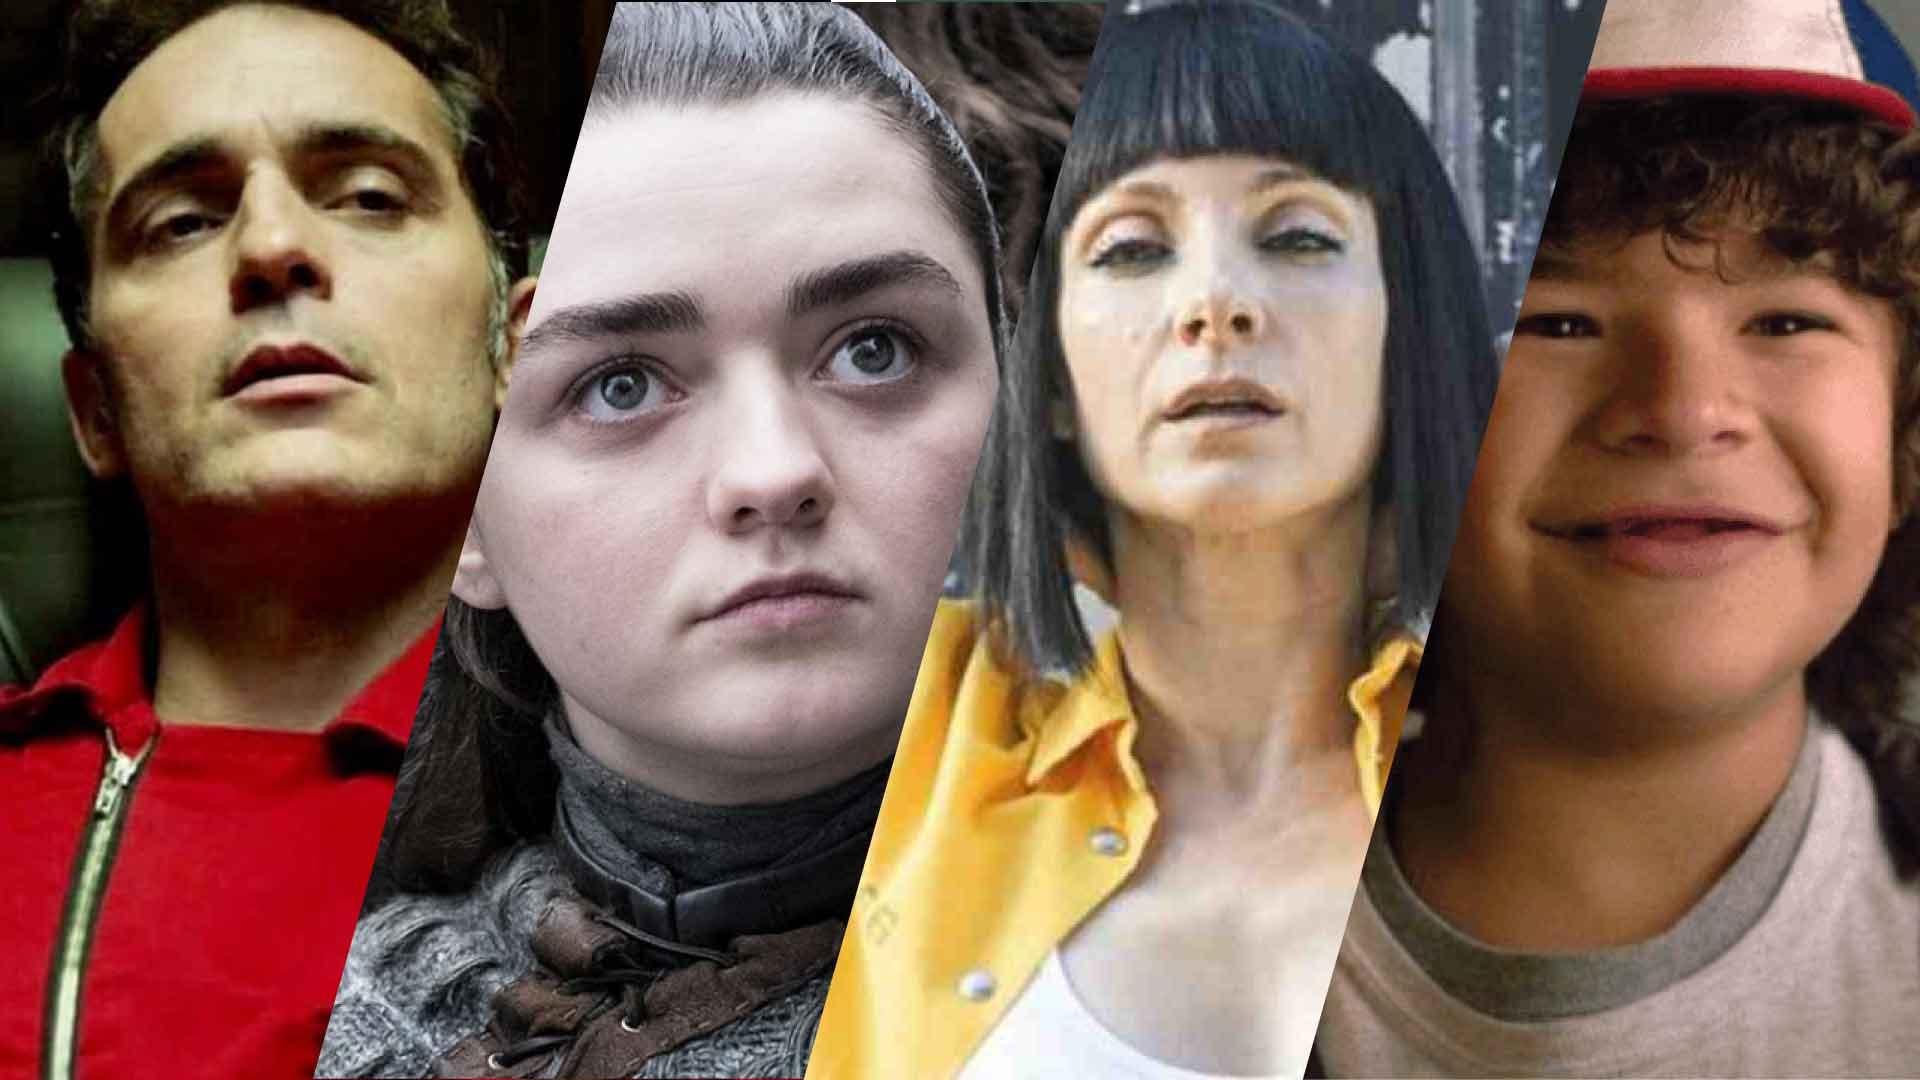 berlino, arya stark, zulema, dustin. Personaggi di serie TV costruiti su archetipi di Jung